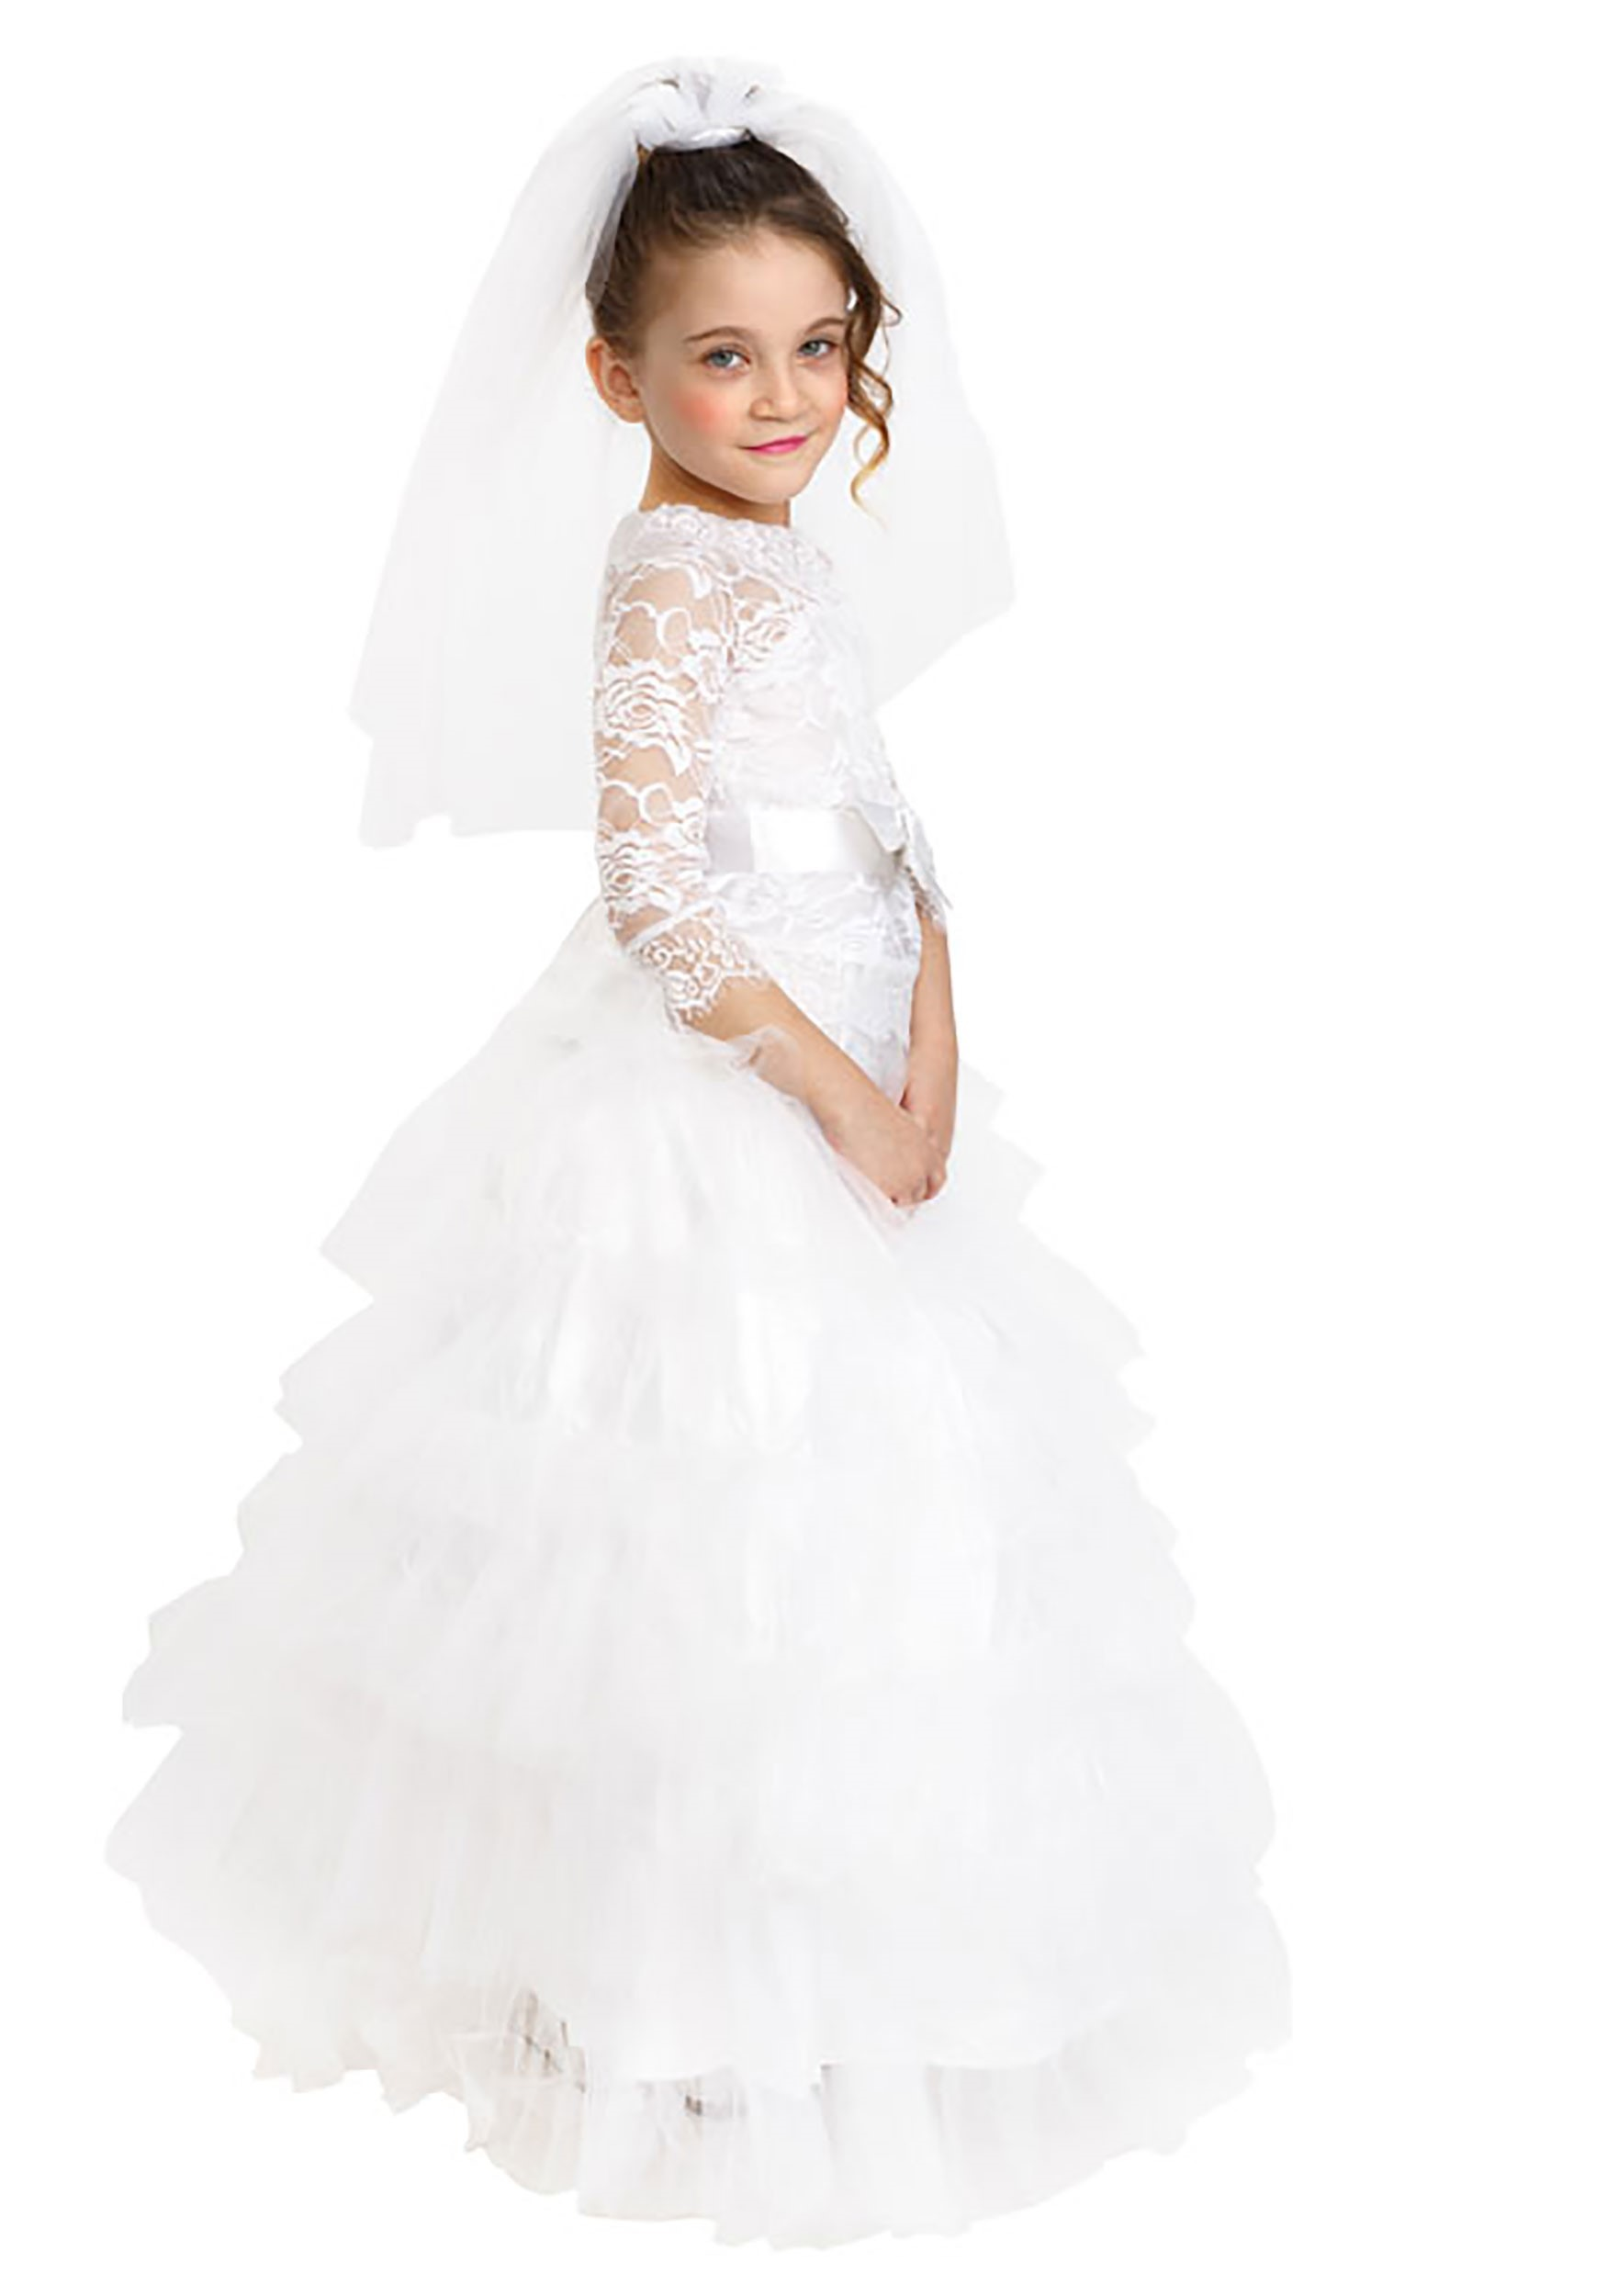 Dress Up Bride Girls Costume